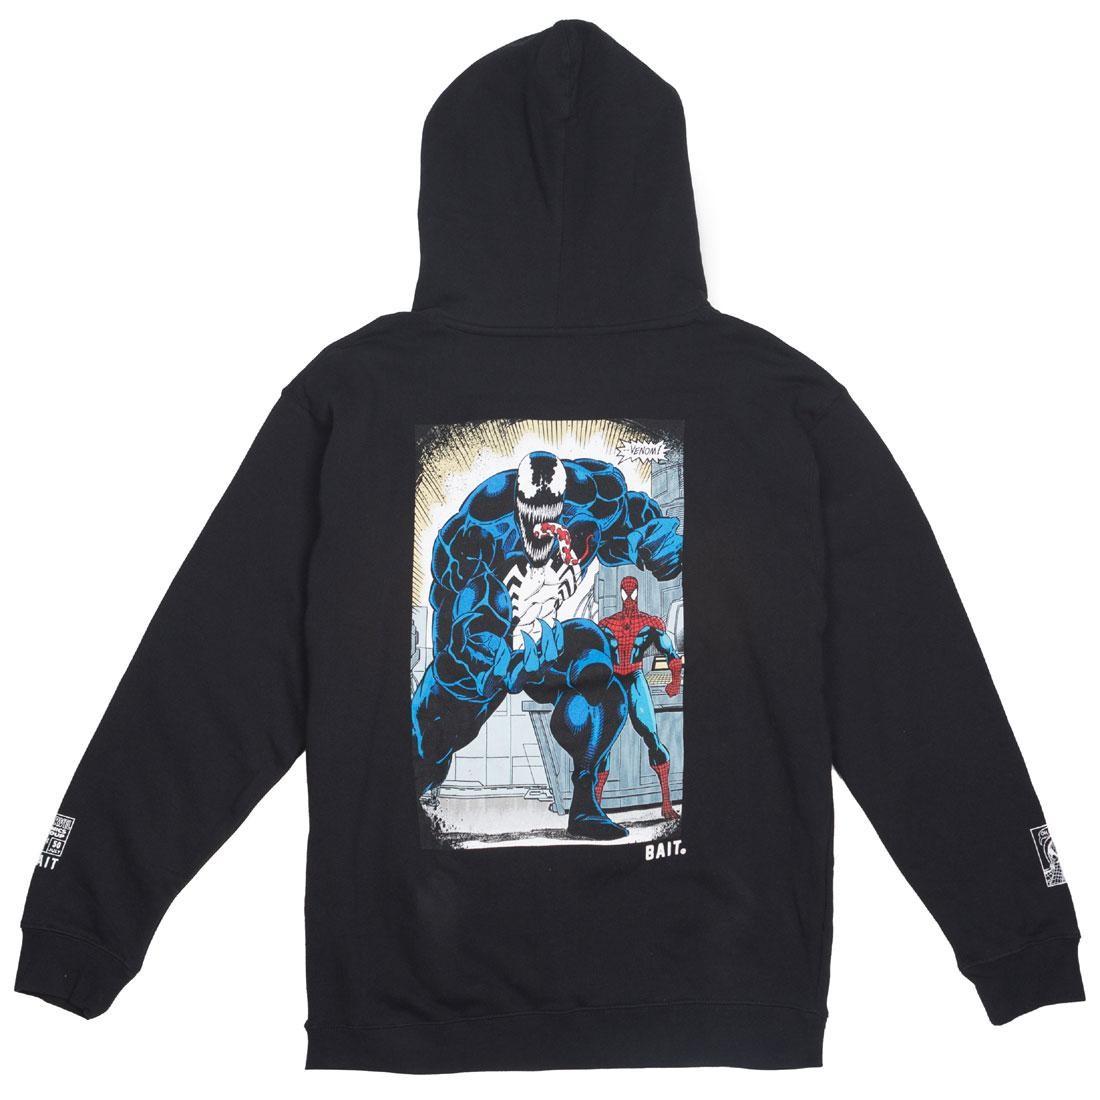 BAIT x Marvel Men Venom Stance Hoody black